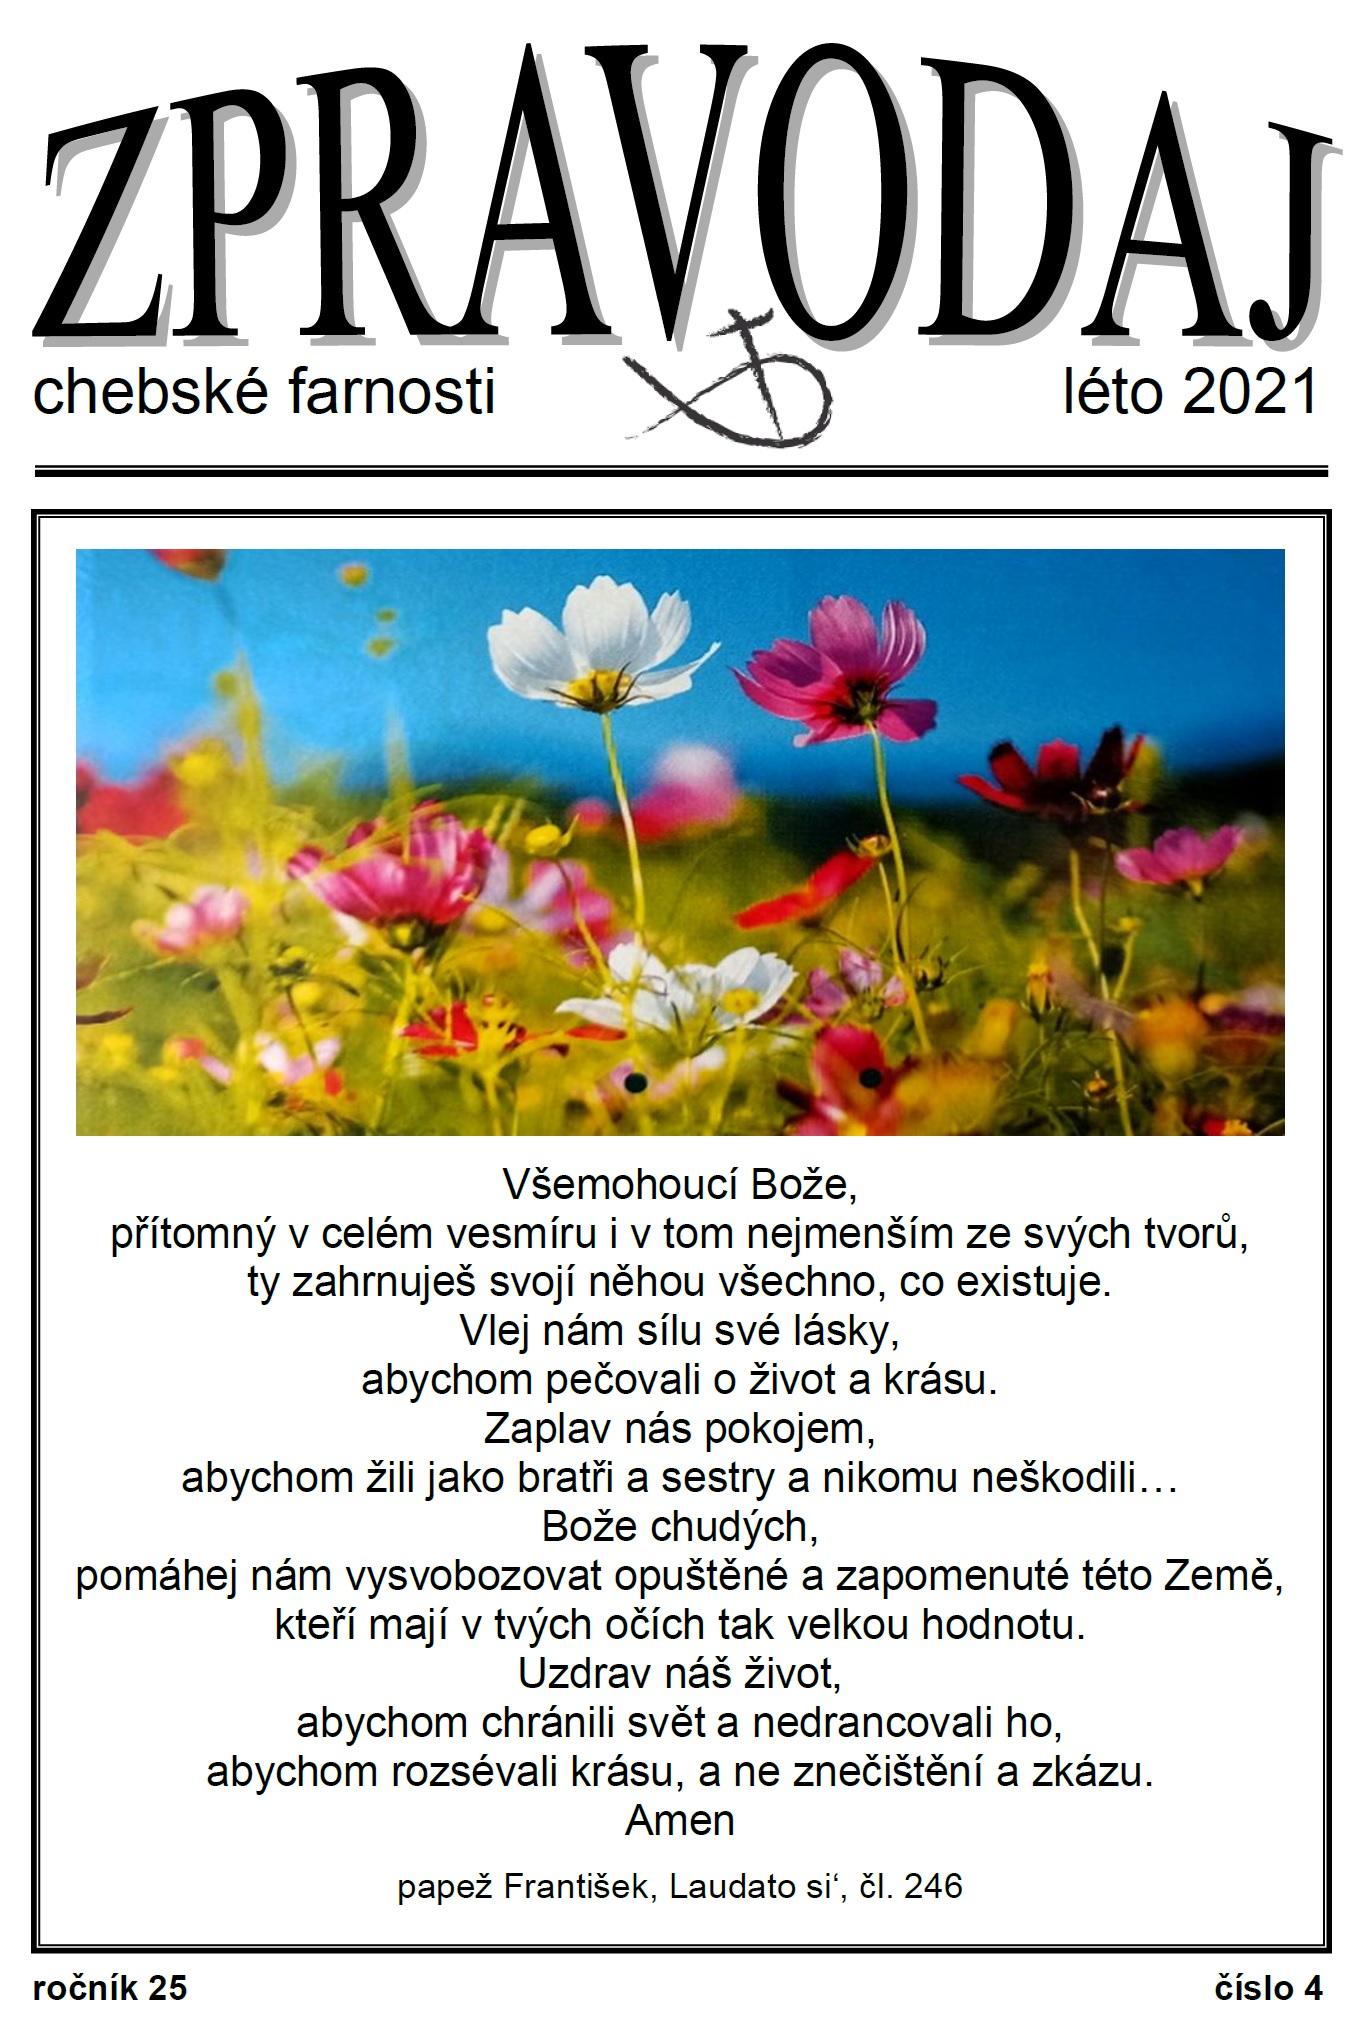 Zpravodaj Cheb 2021 04 léto